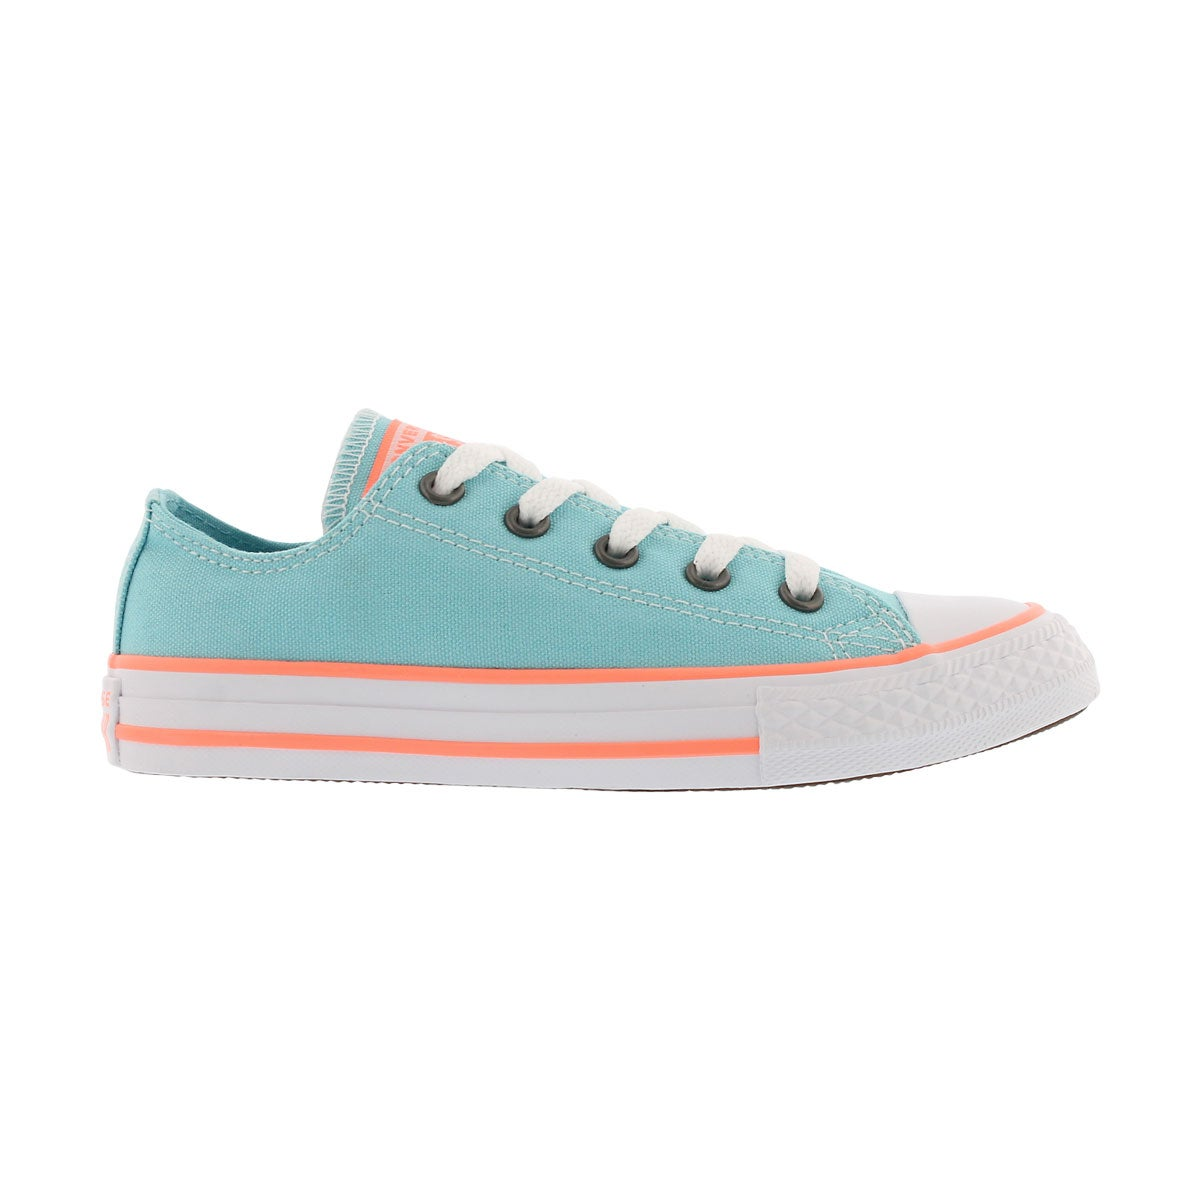 Grls CTAS Seasonal bleached aqua sneaker